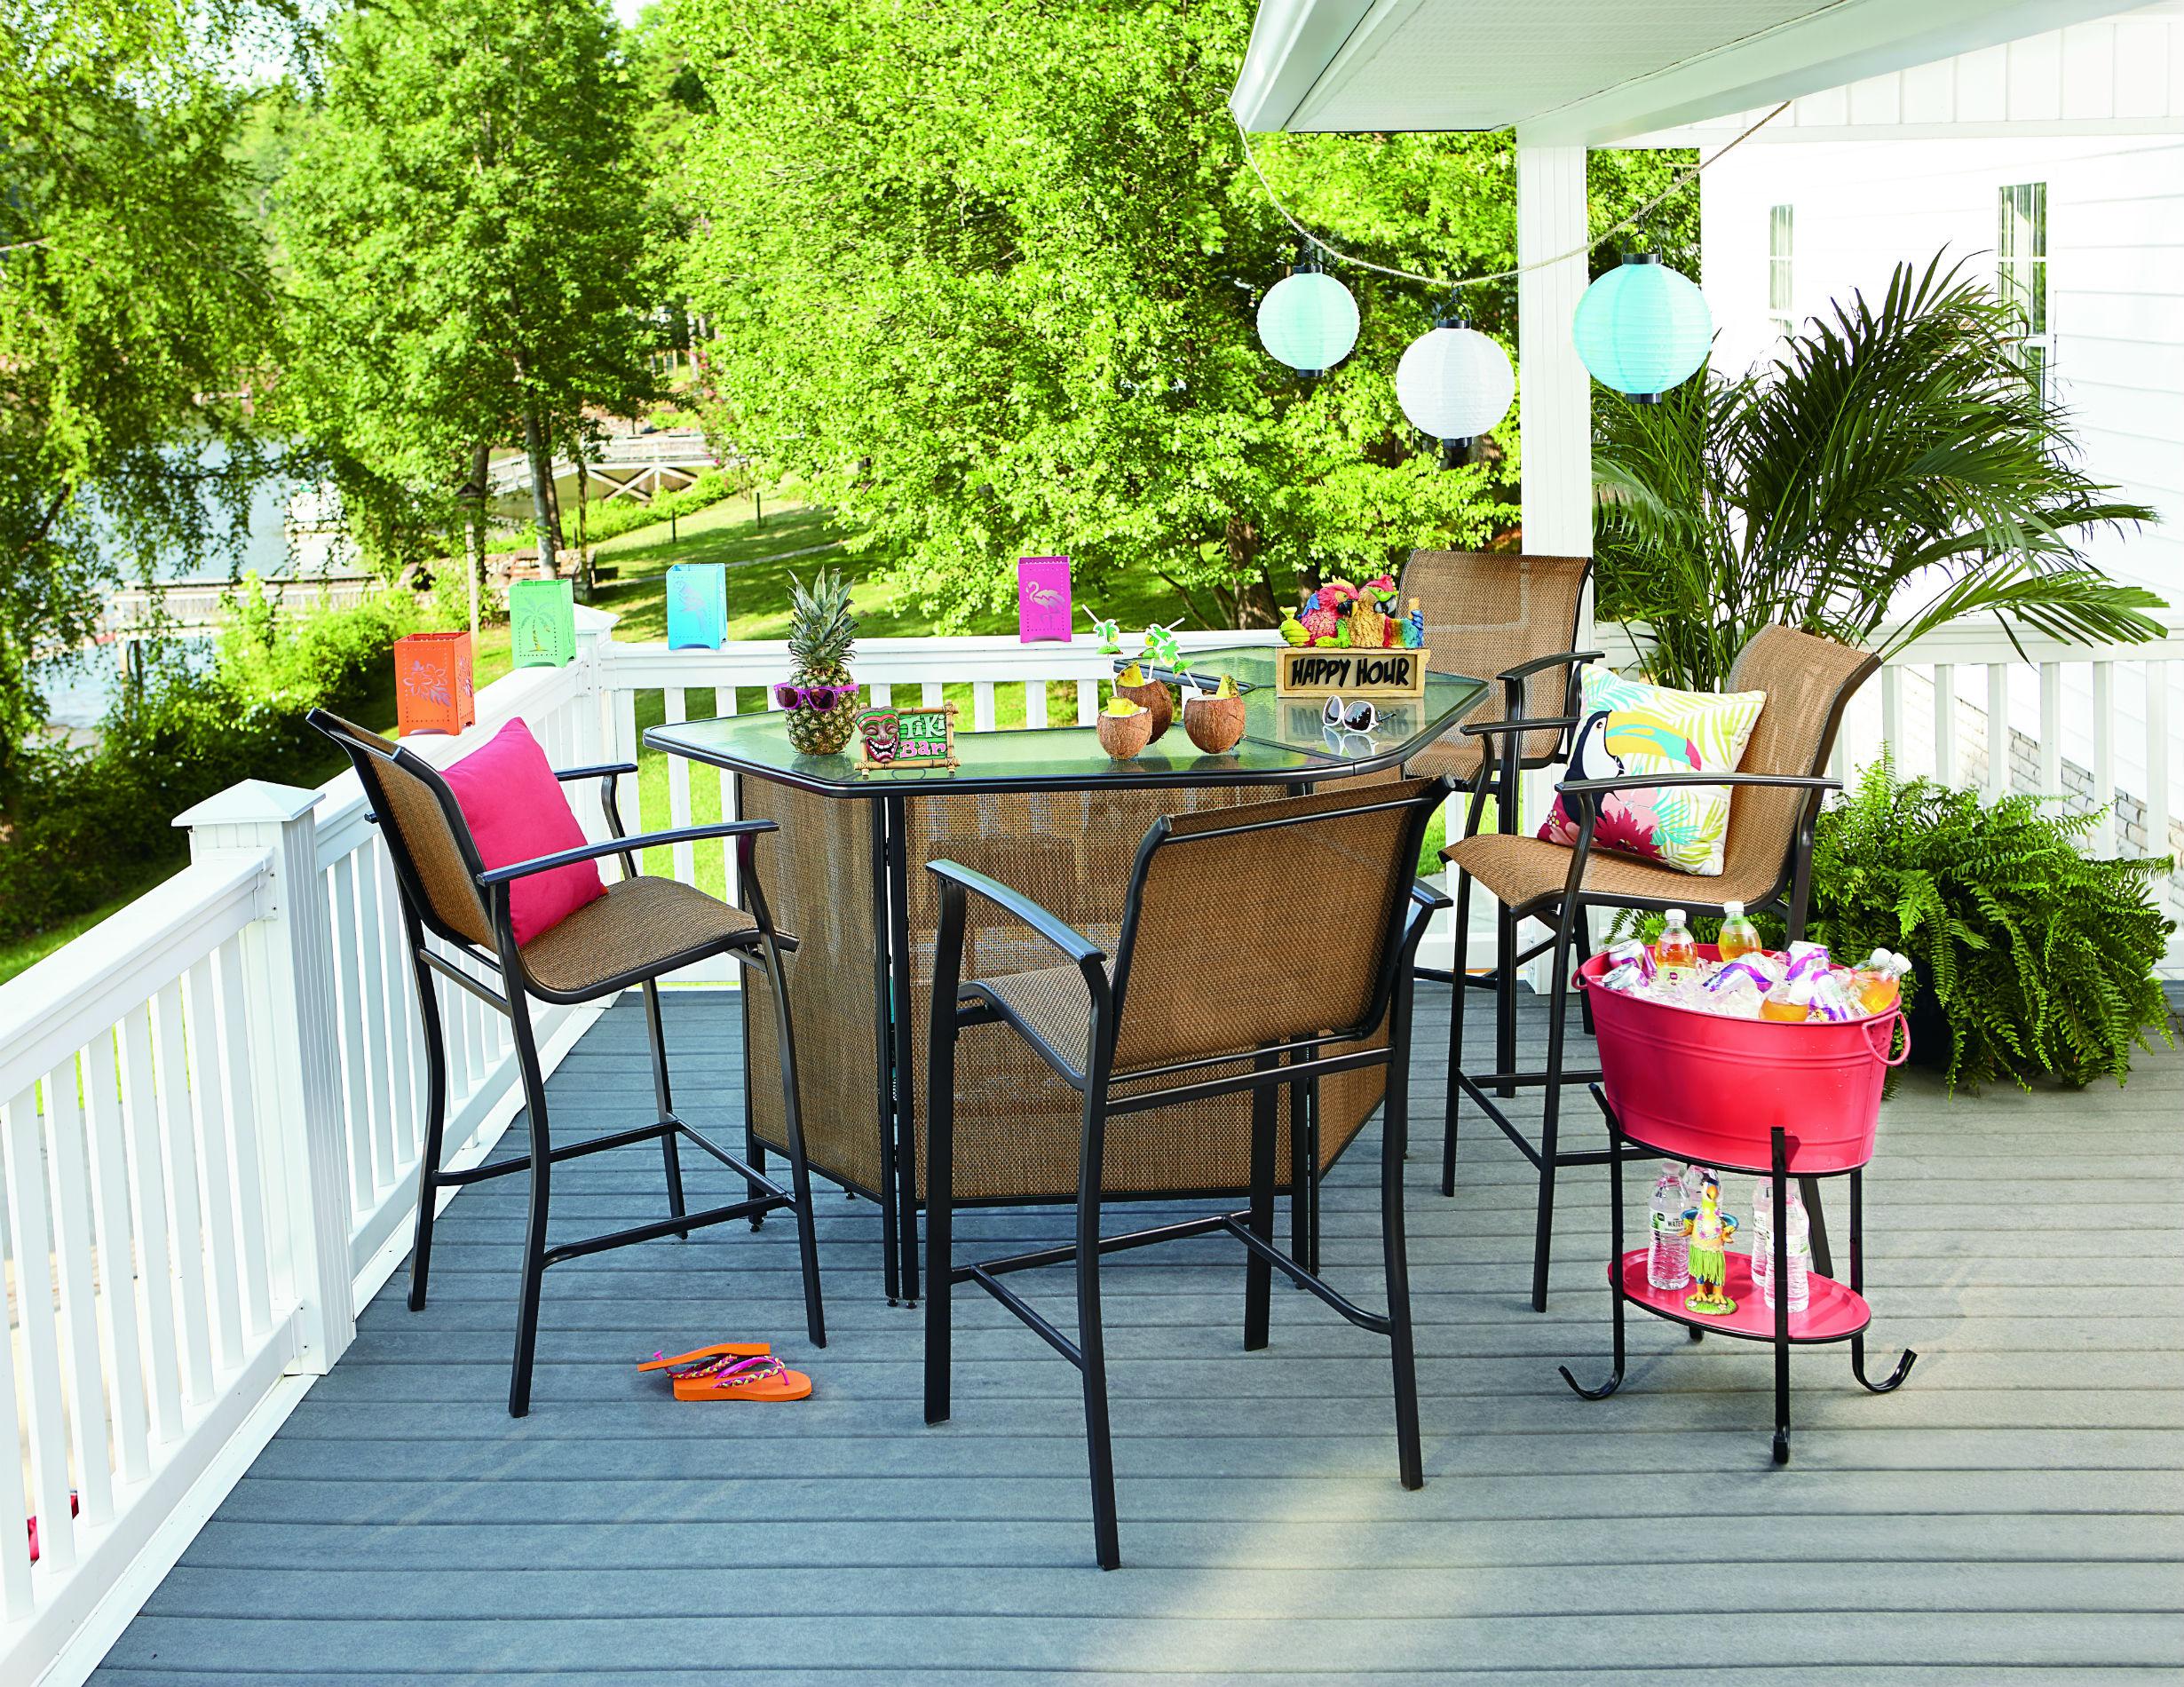 essential garden fulton 5-piece patio bar set *limited availability XIXBZAU